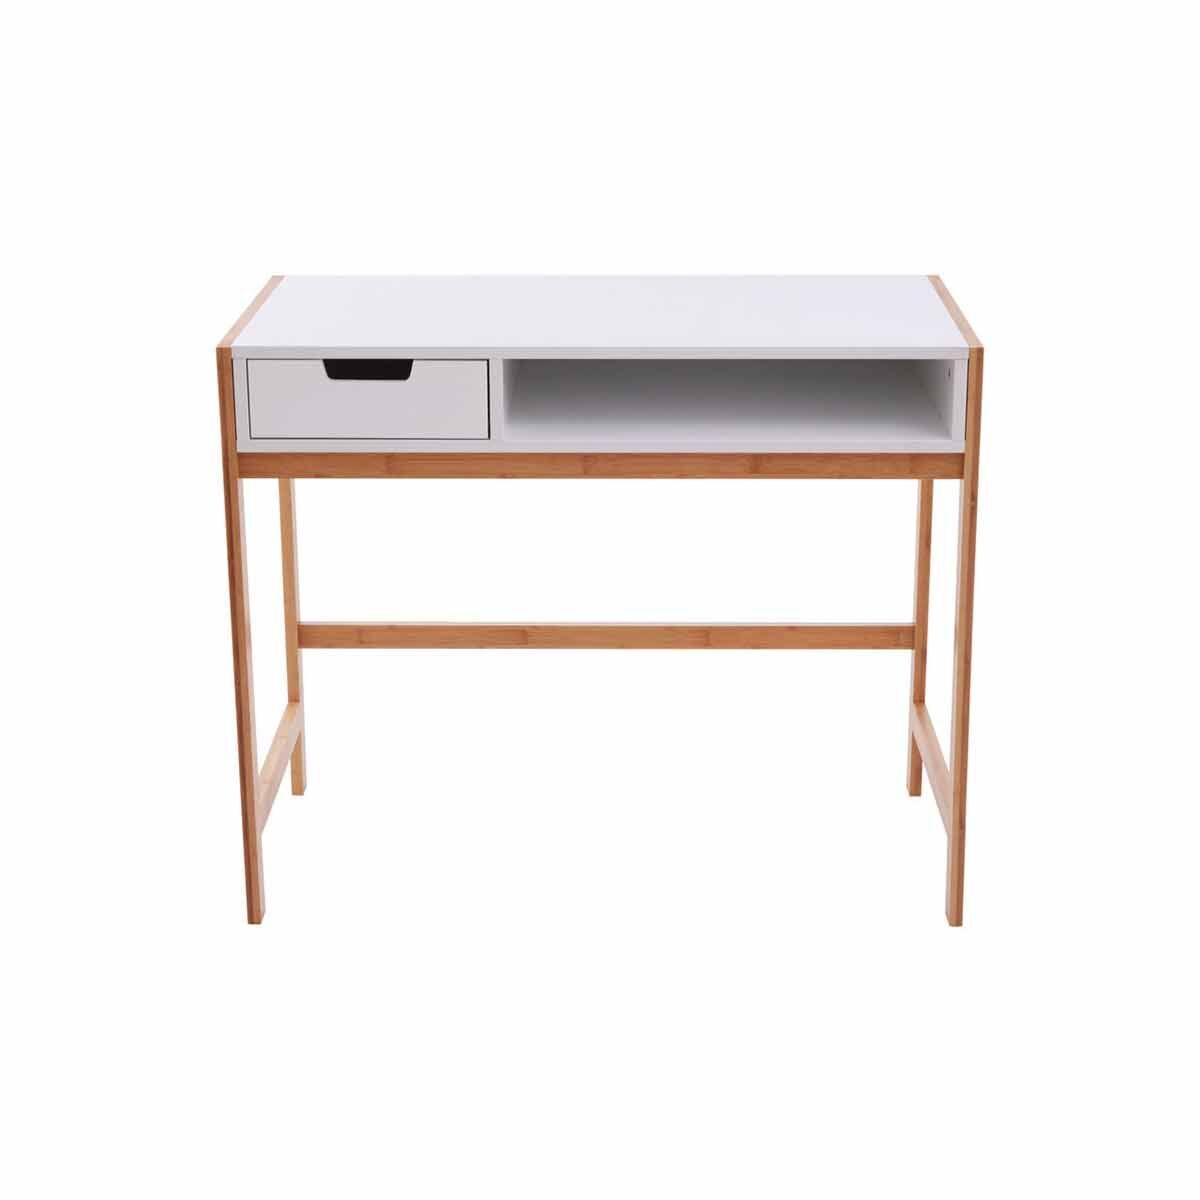 Premier Housewares 1 Drawer Desk with Bamboo Frame